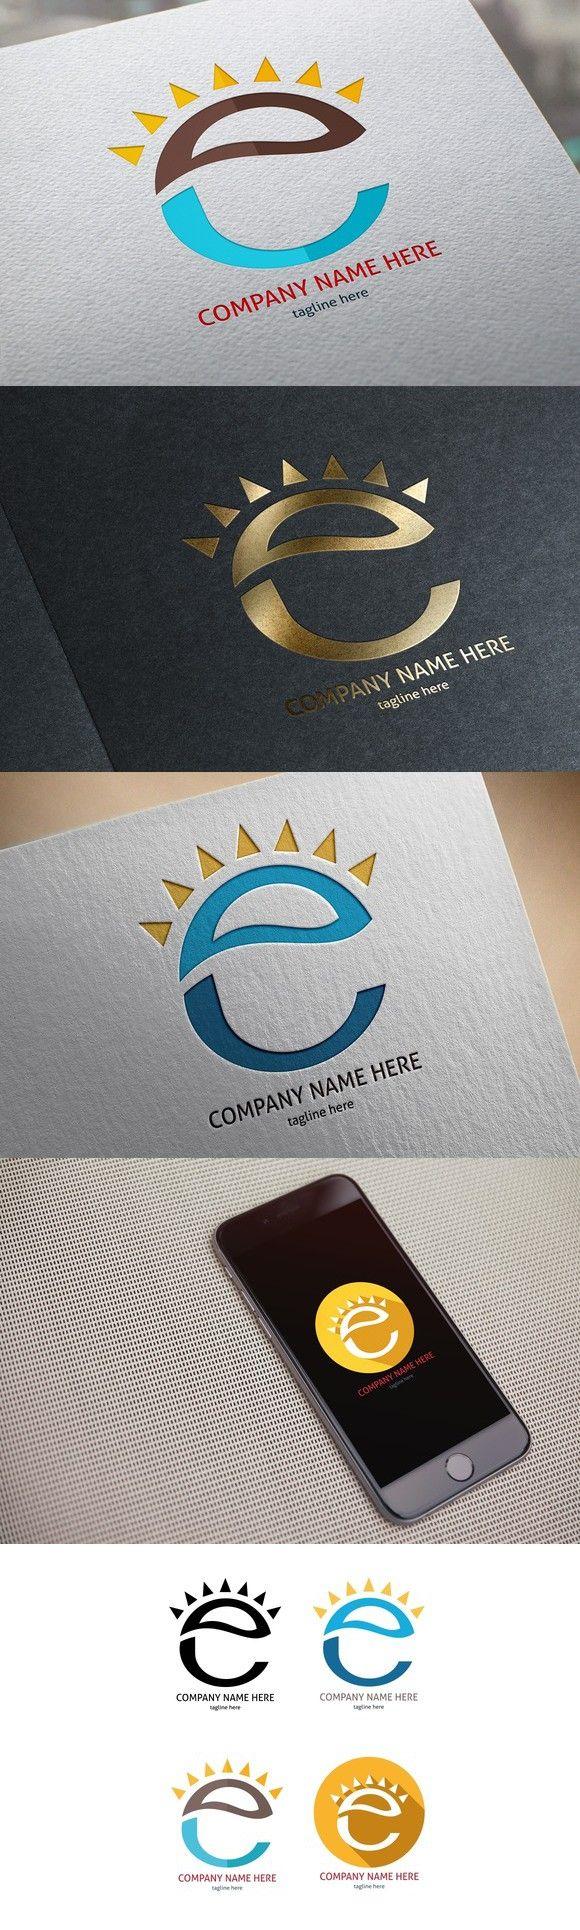 21 best sun logo images on Pinterest | Sun logo, A logo and Free ...